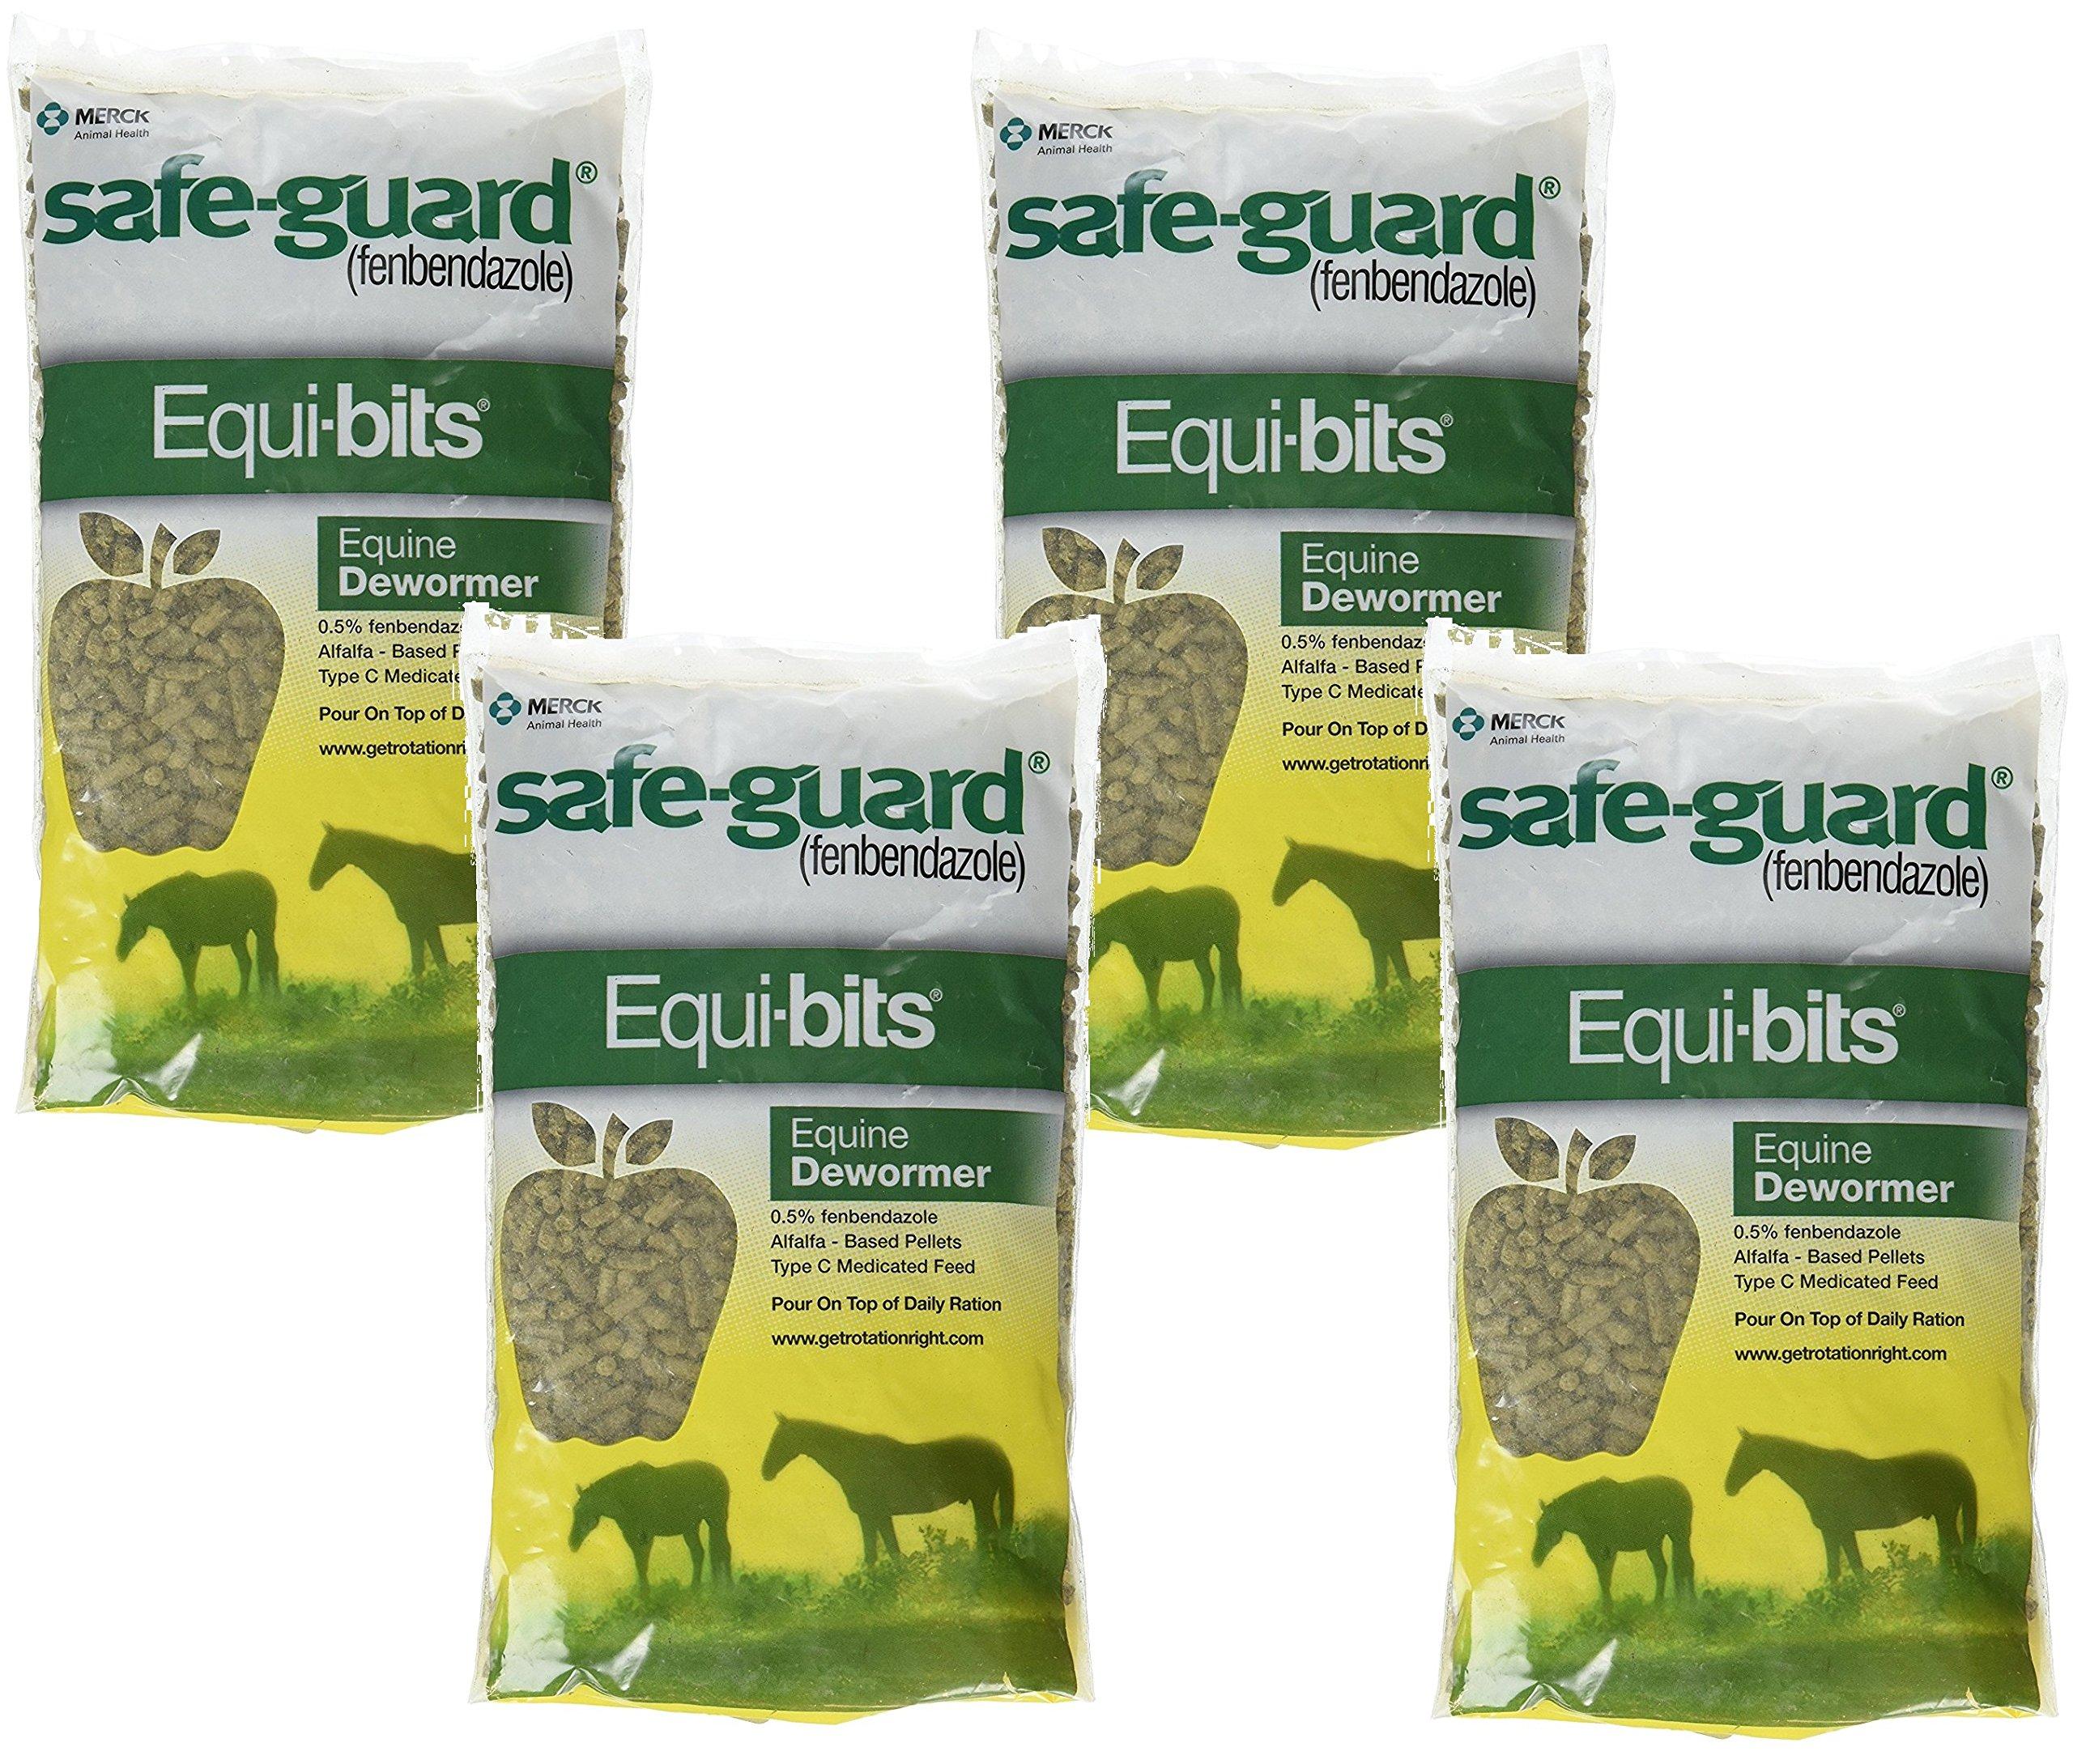 (4 Pack) Intervet Safeguard Dewormer Pellets for Horses, 1.25-Pound each